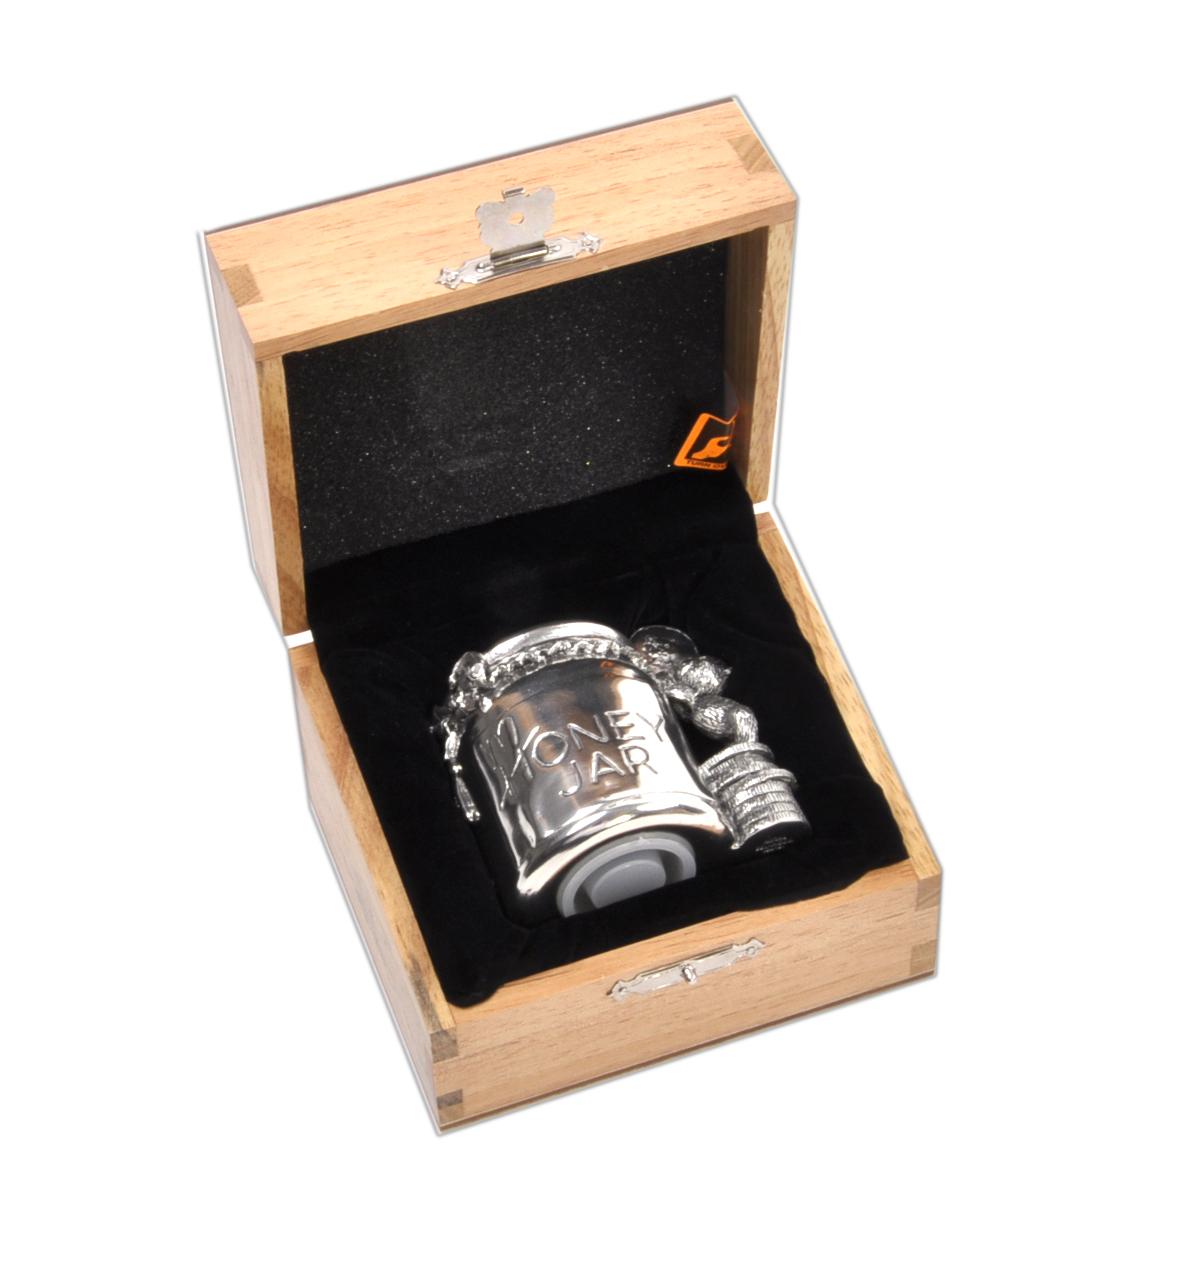 Honey Jar Pewter Money Box By Royal Selangor In Wooden